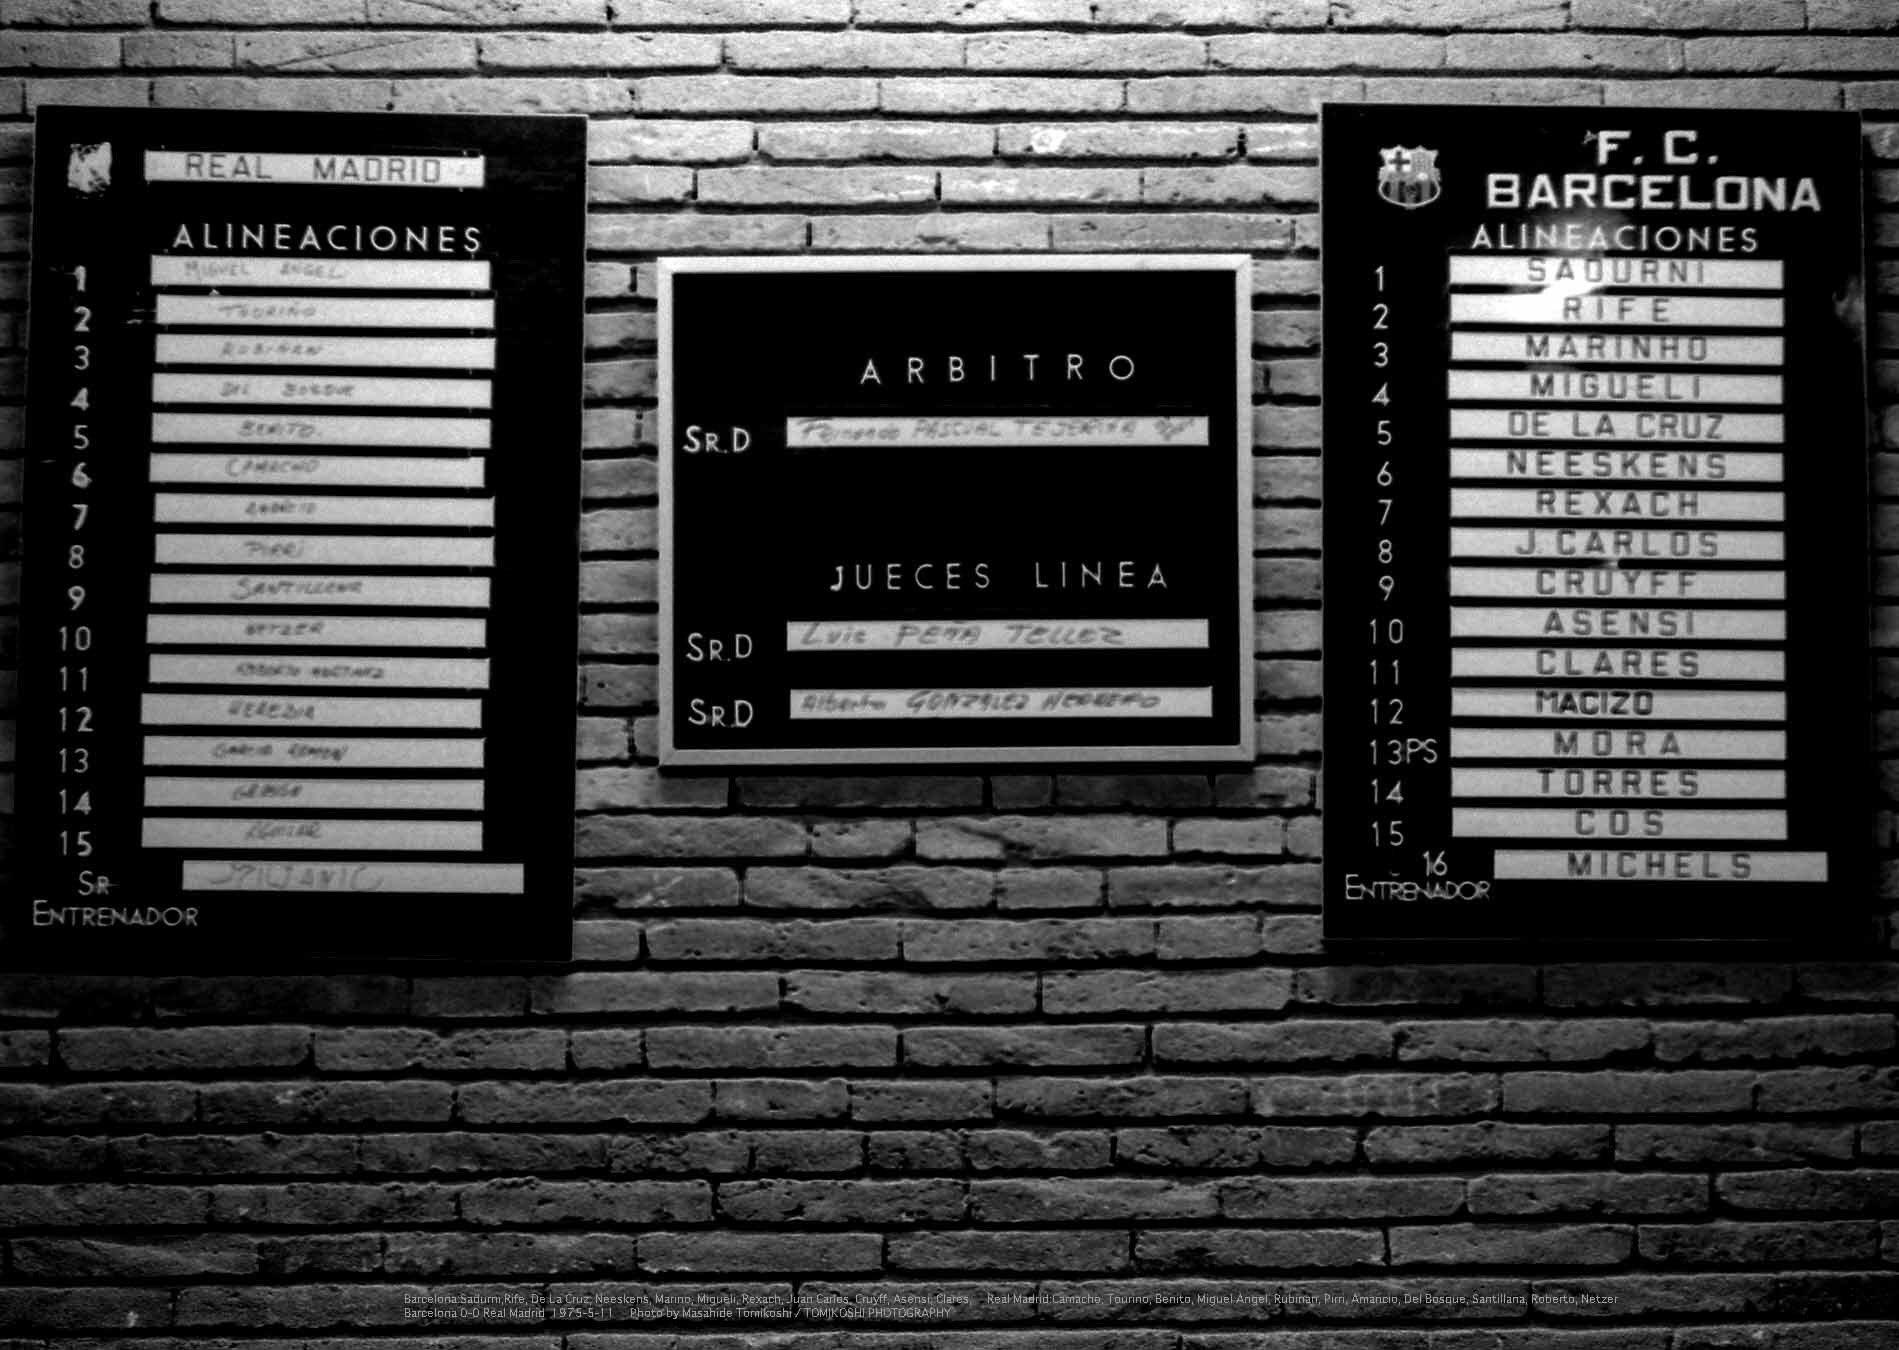 FOTOS HISTORICAS O CHULAS  DE FUTBOL - Página 13 EME3dKmXUAMq-YJ?format=jpg&name=large